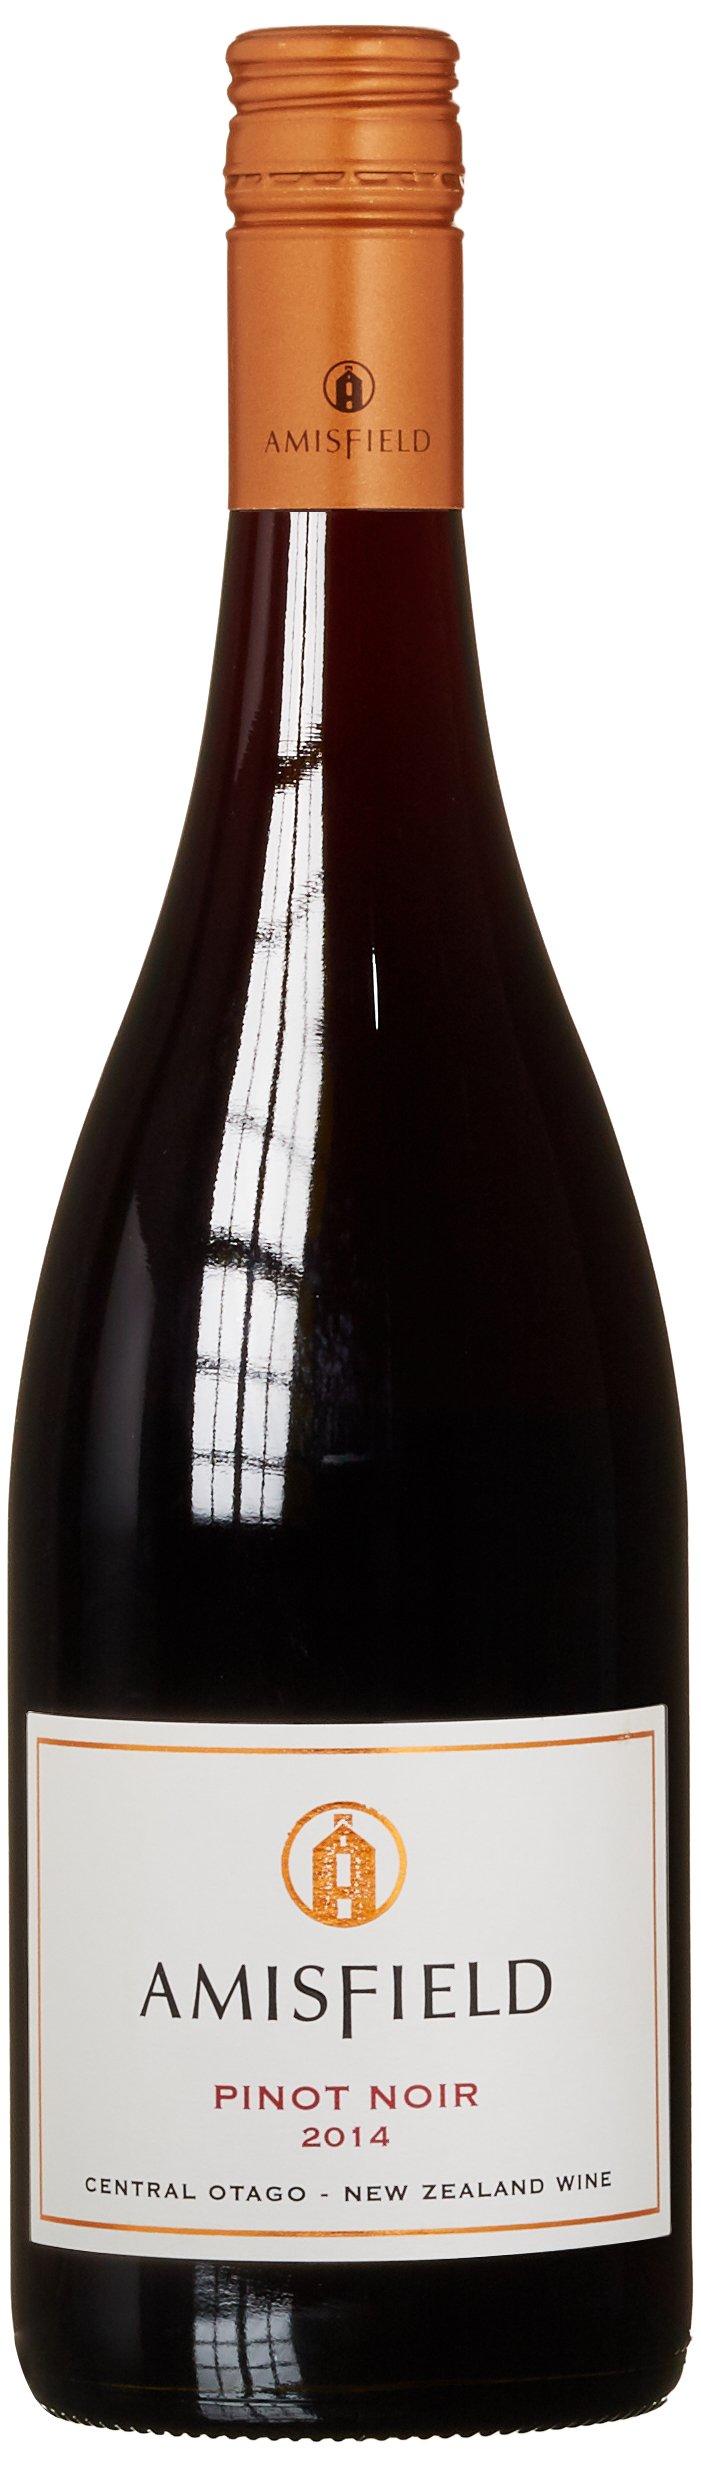 Amisfield-Pinot-Noir-2014-1-x-075-l